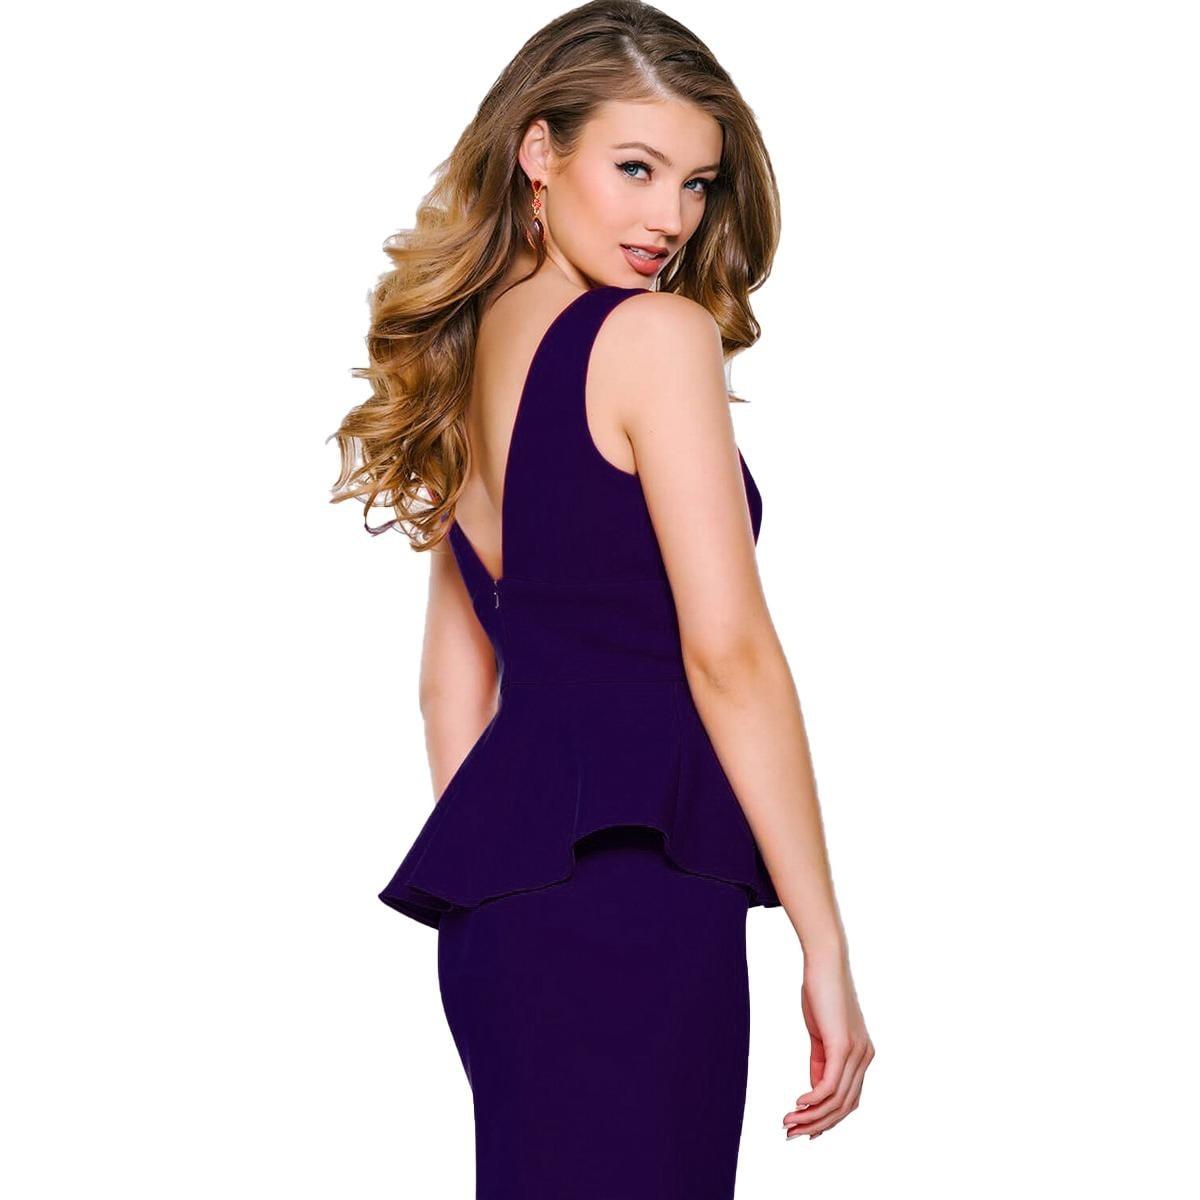 bed1cdca691 Shop Jovani Peplum Sleeveless Formal Dress - Free Shipping Today -  Overstock.com - 20489116